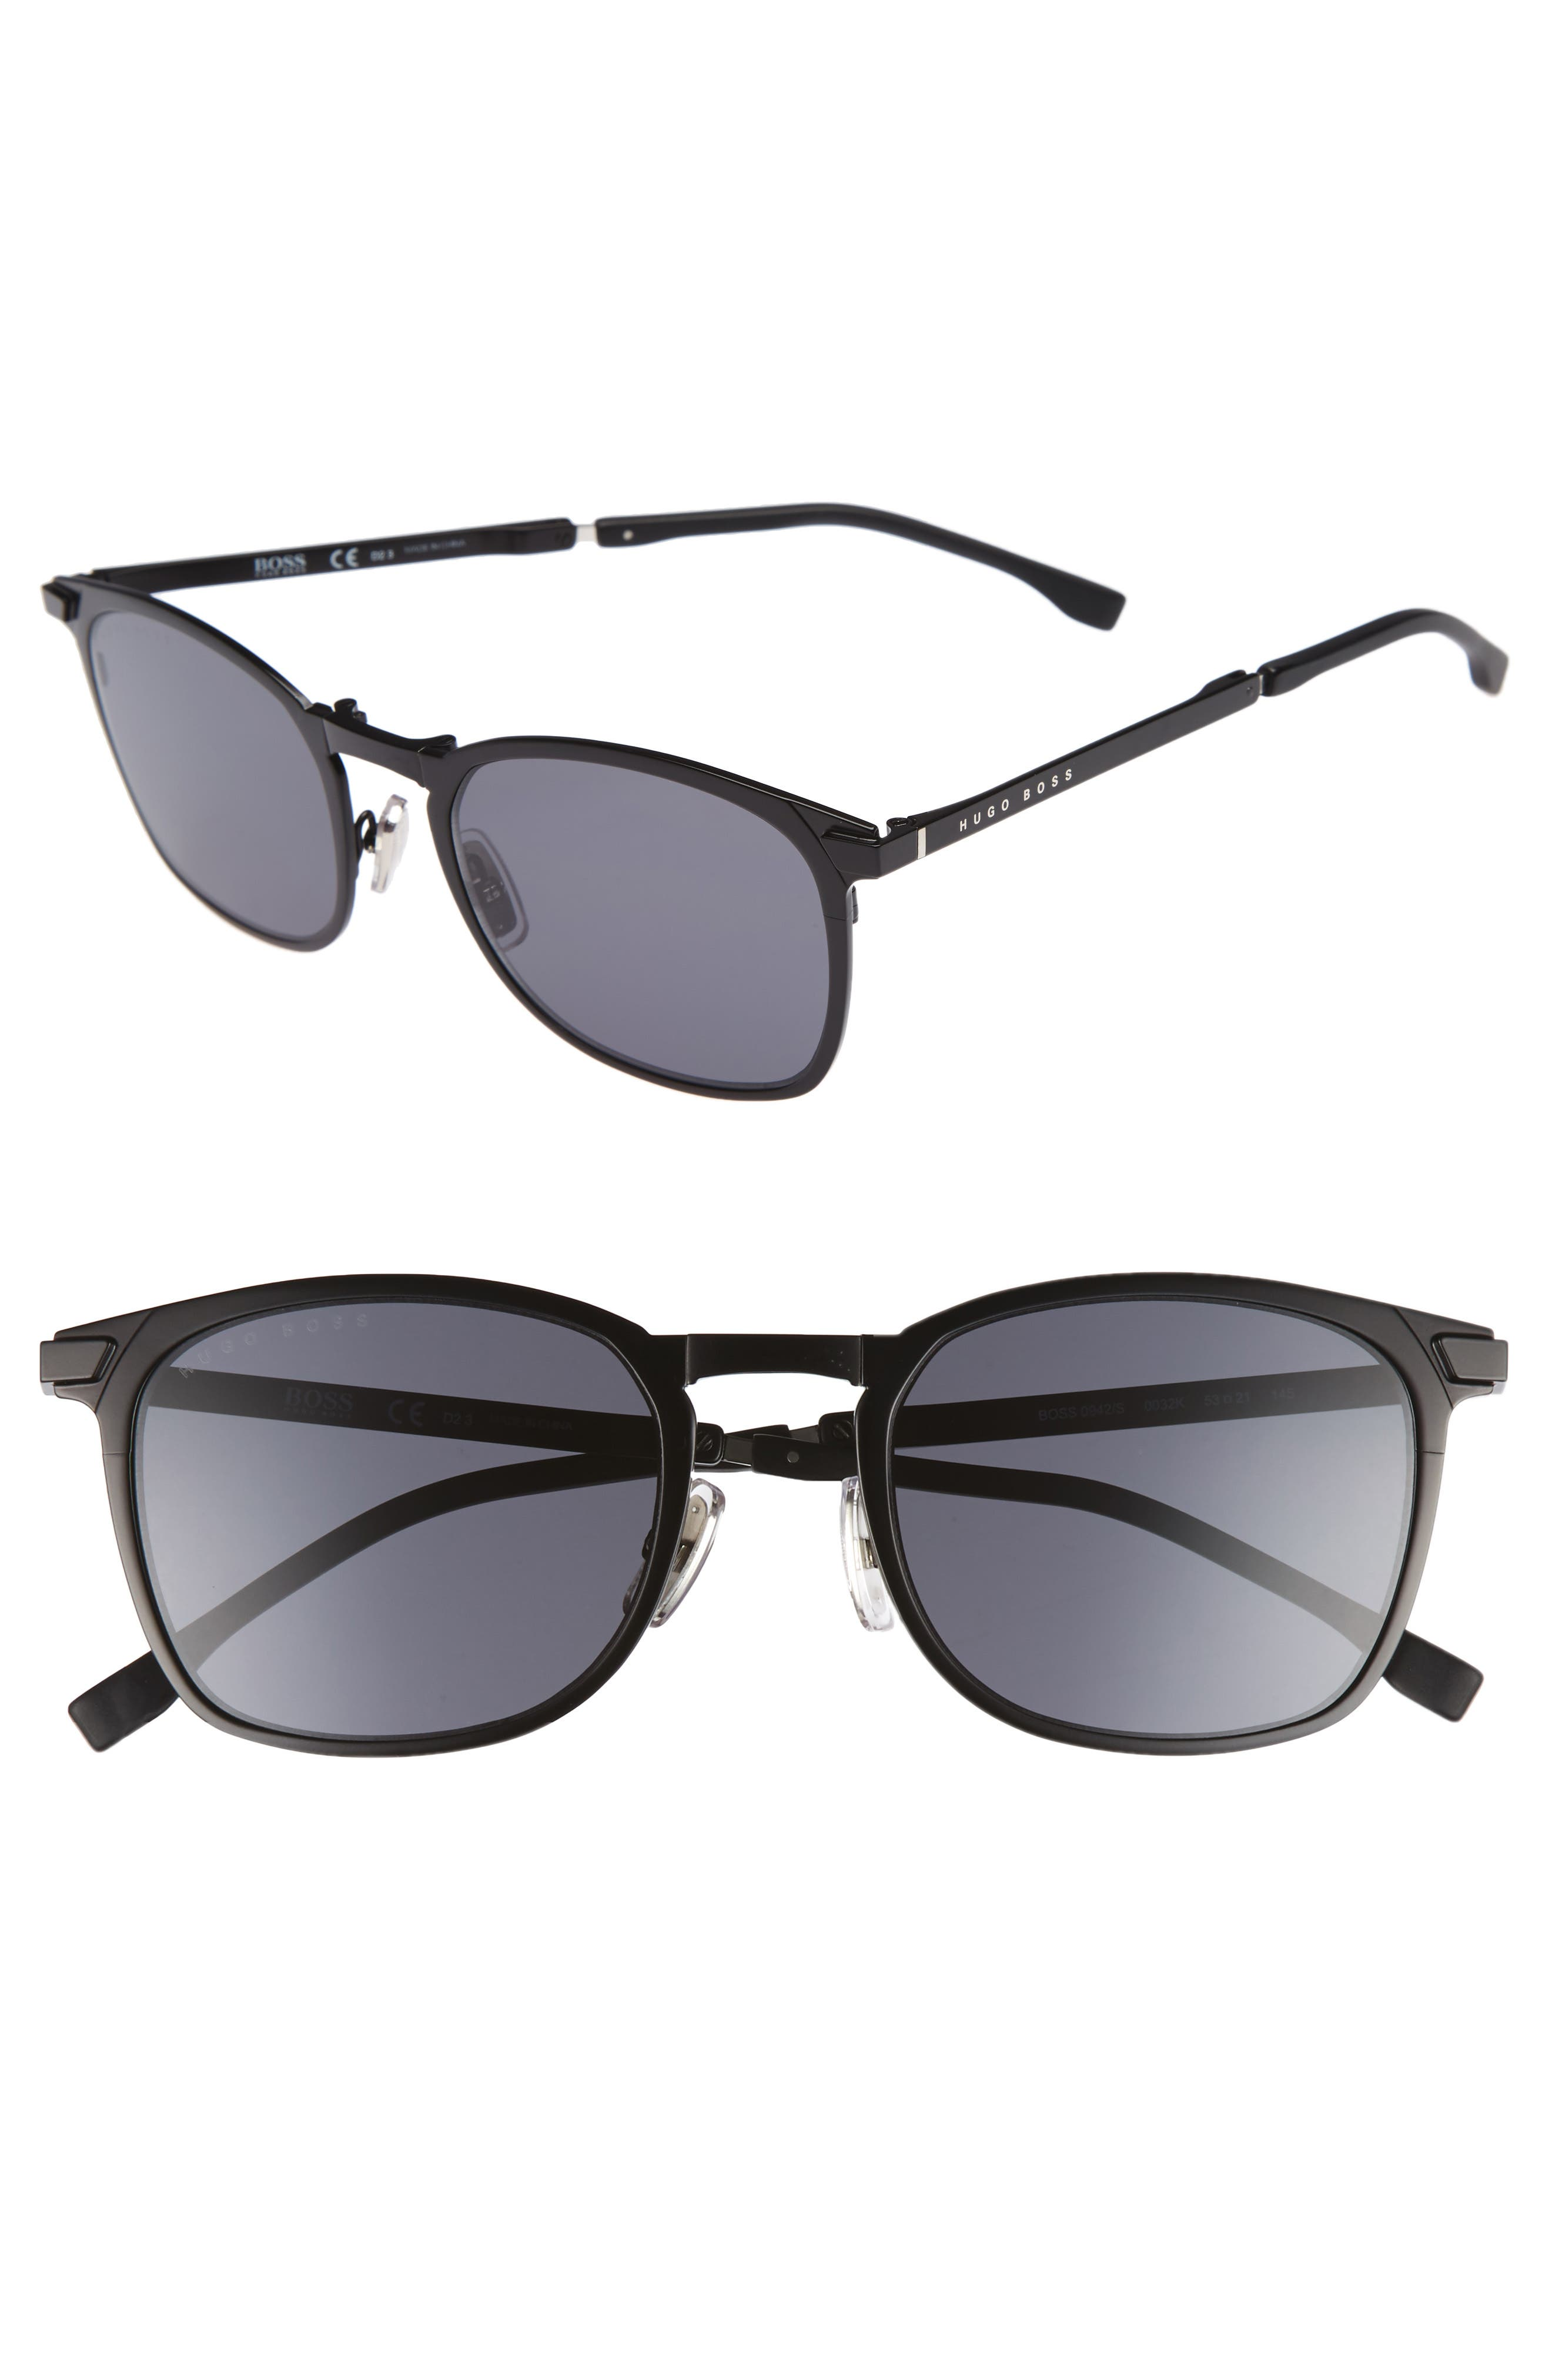 53mm Sunglasses,                             Main thumbnail 1, color,                             Matte Black/ Gray